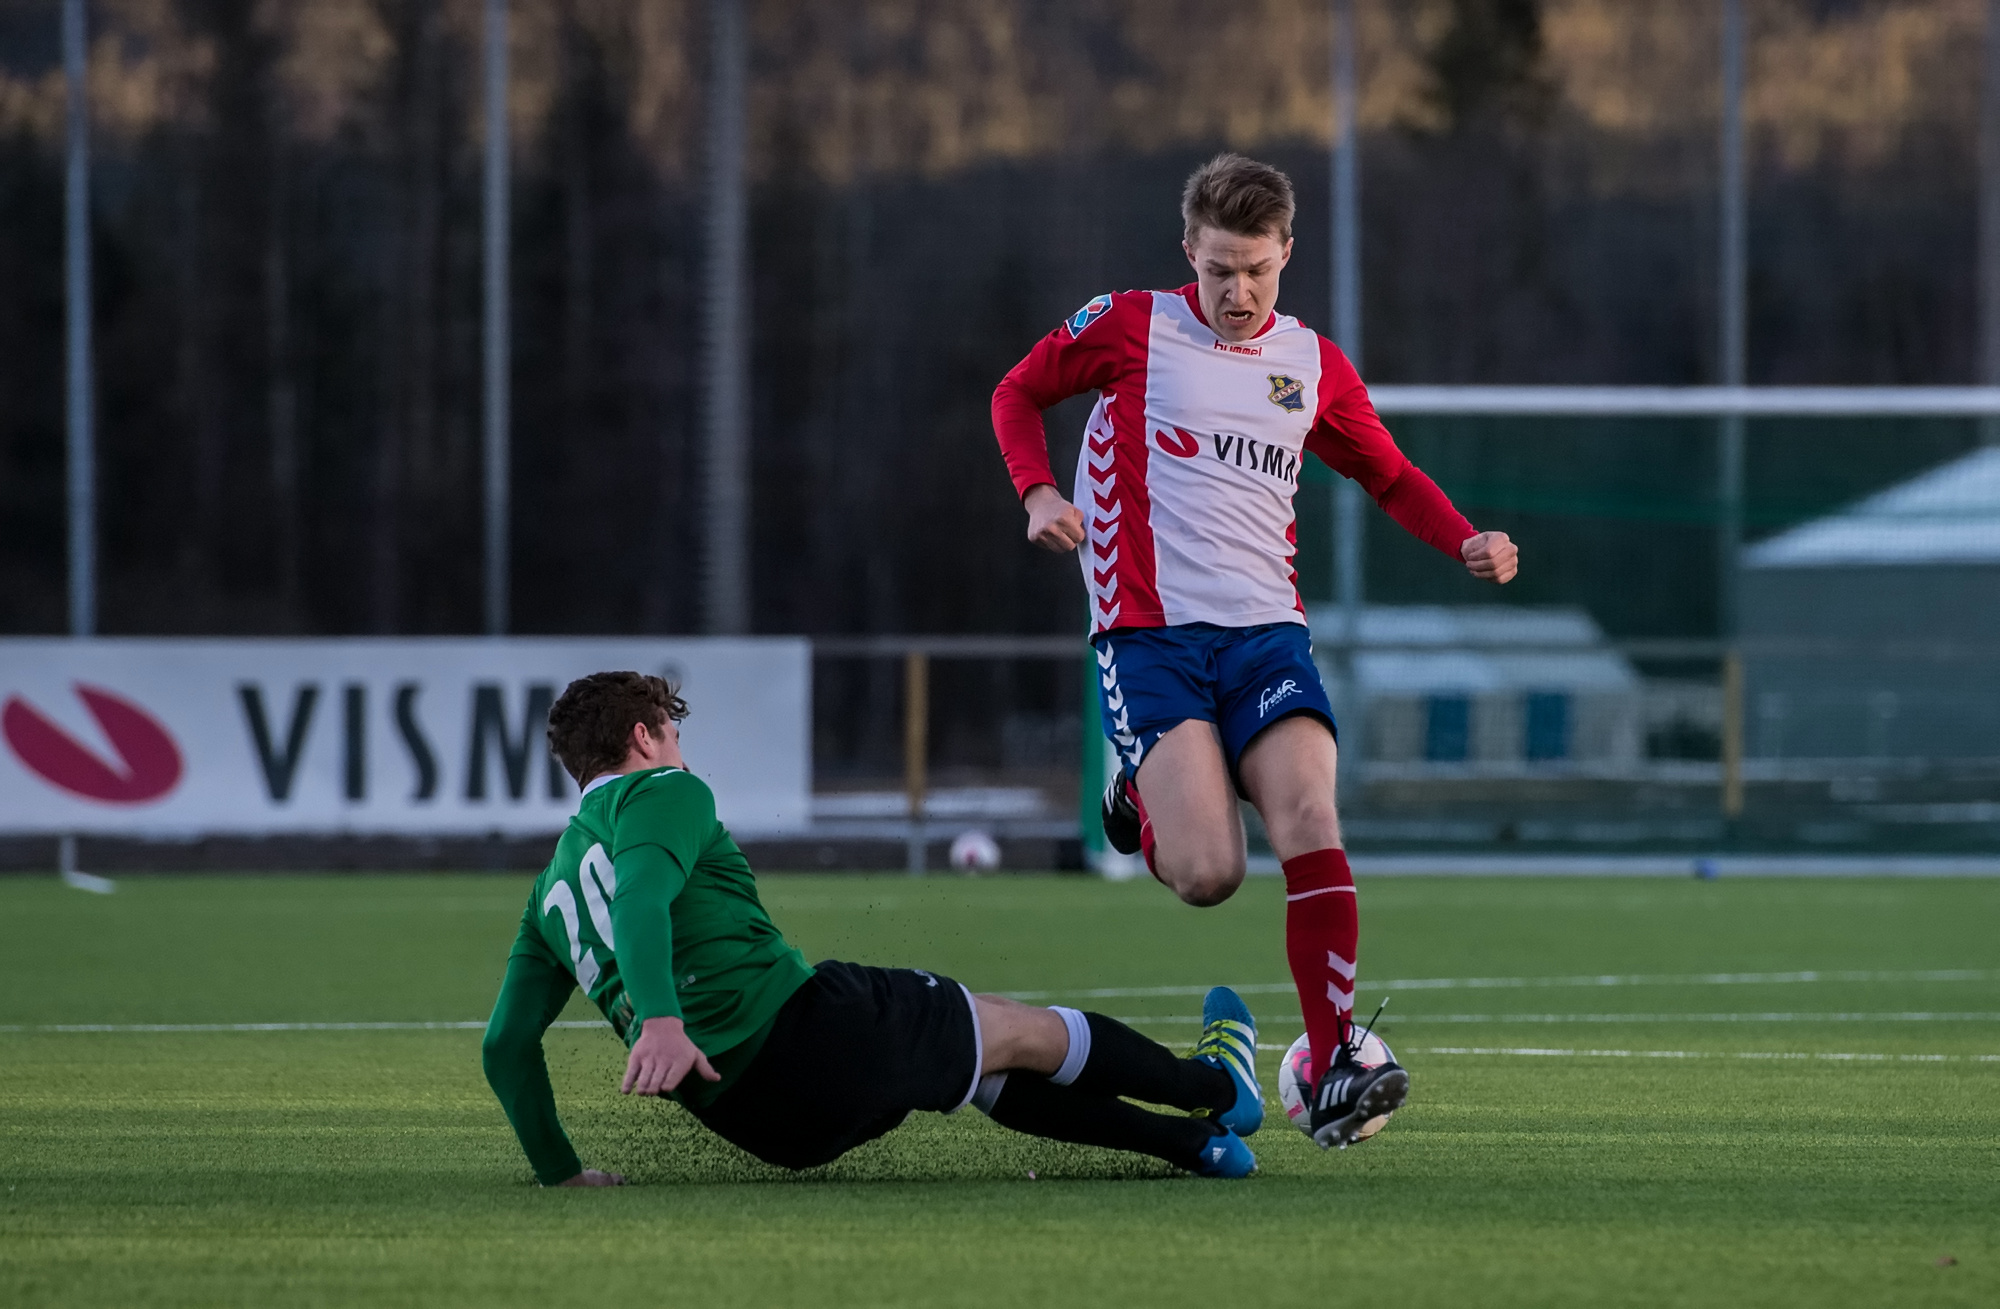 FB_Lyn_Gjelleraasen_cup2017_LarsOpstad_014.jpg